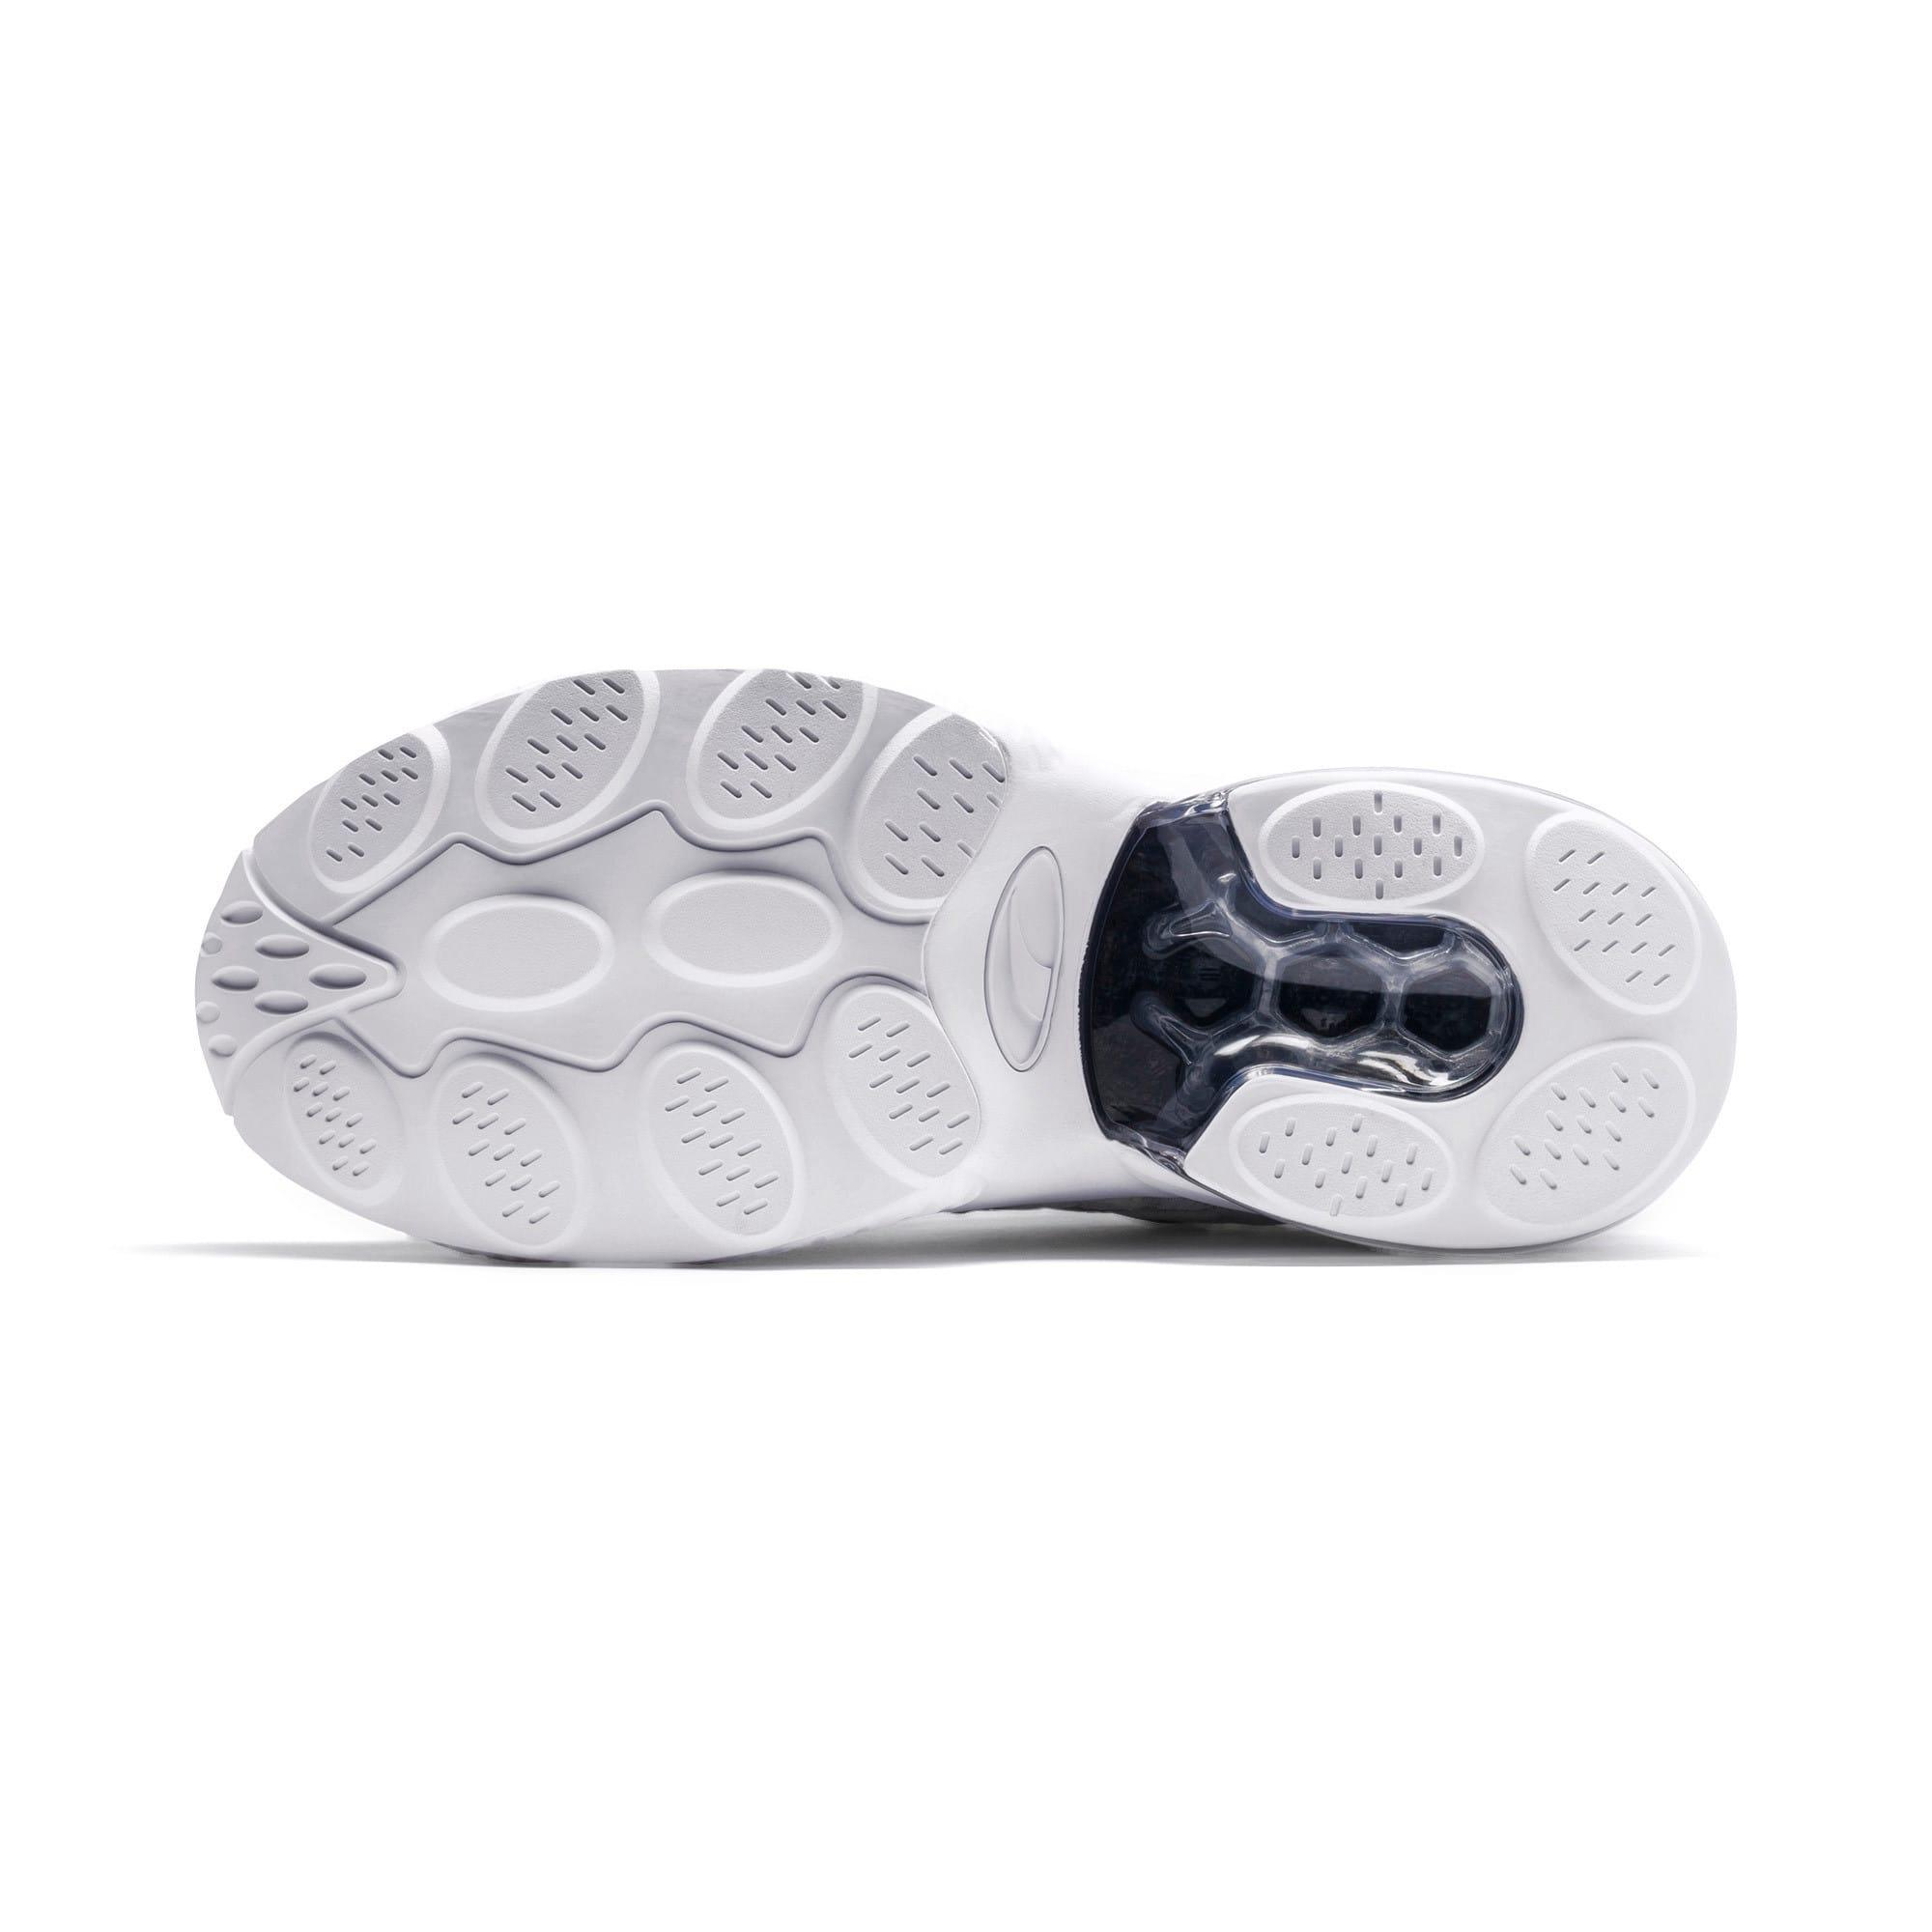 Thumbnail 5 of CELL Venom Reflective Sneakers, Puma White-Puma White, medium